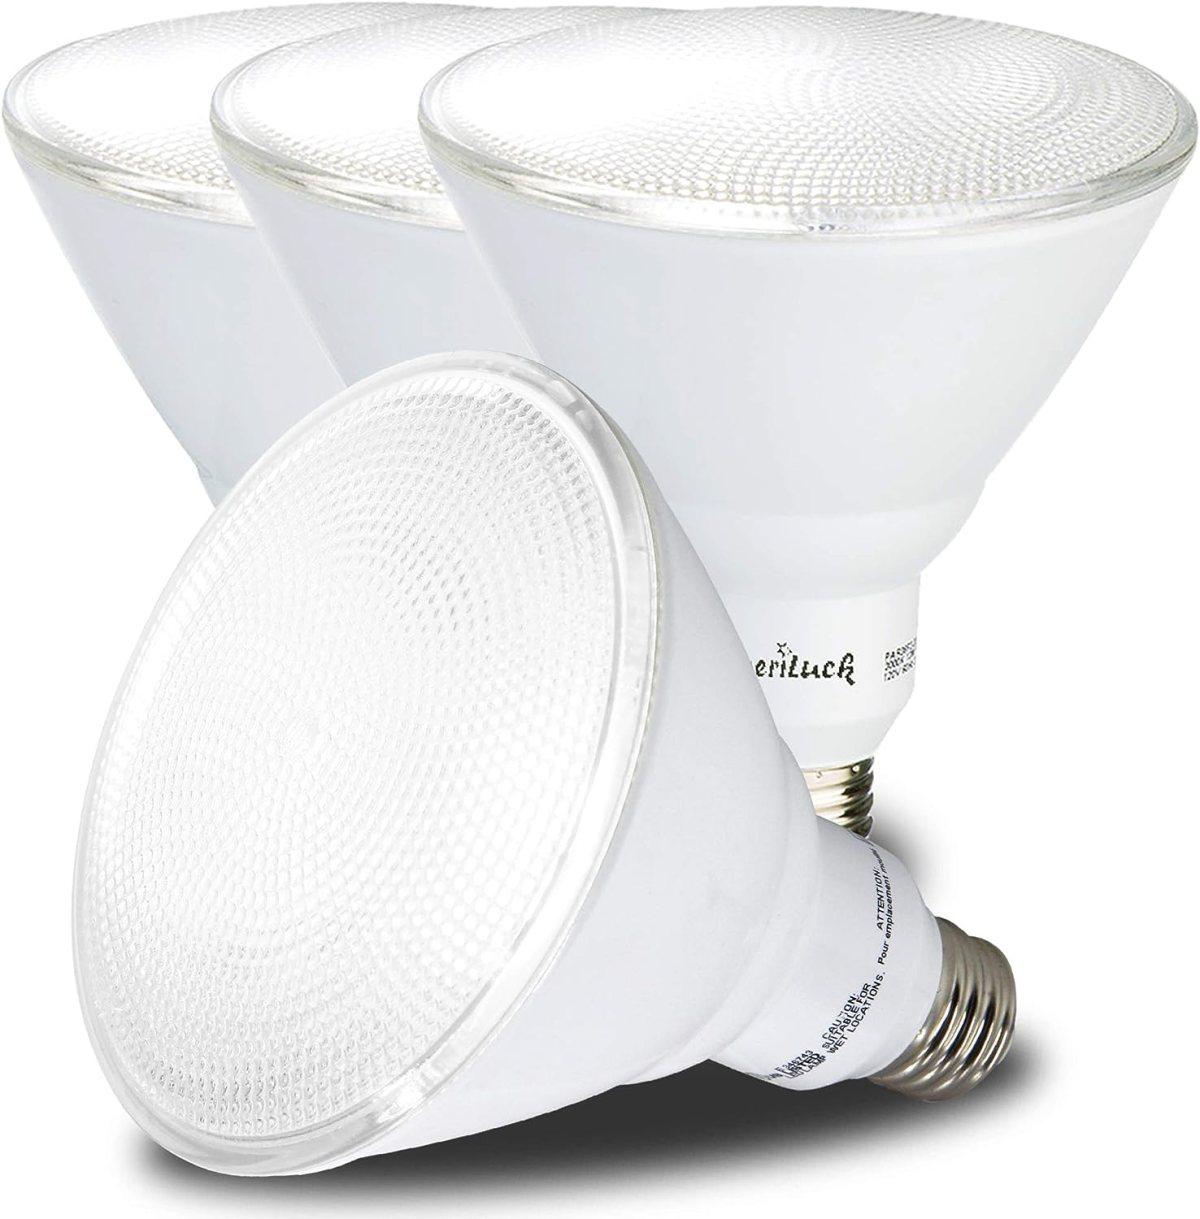 AmeriLuck 5000K Daylight Outdoor PAR38 LED Flood Light Bulb